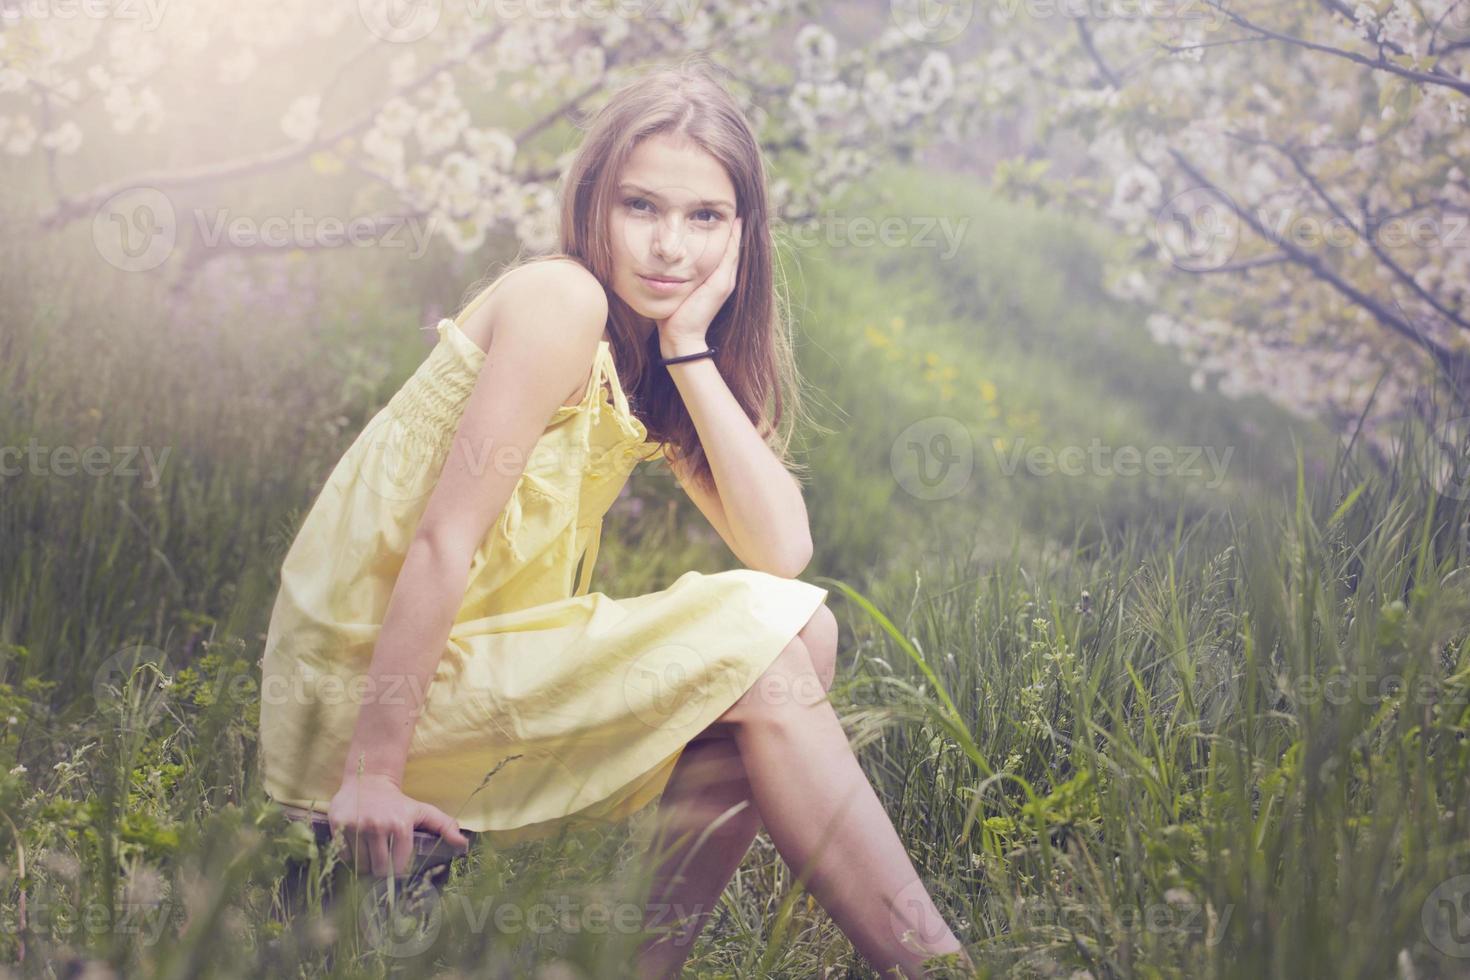 schoonheid foto